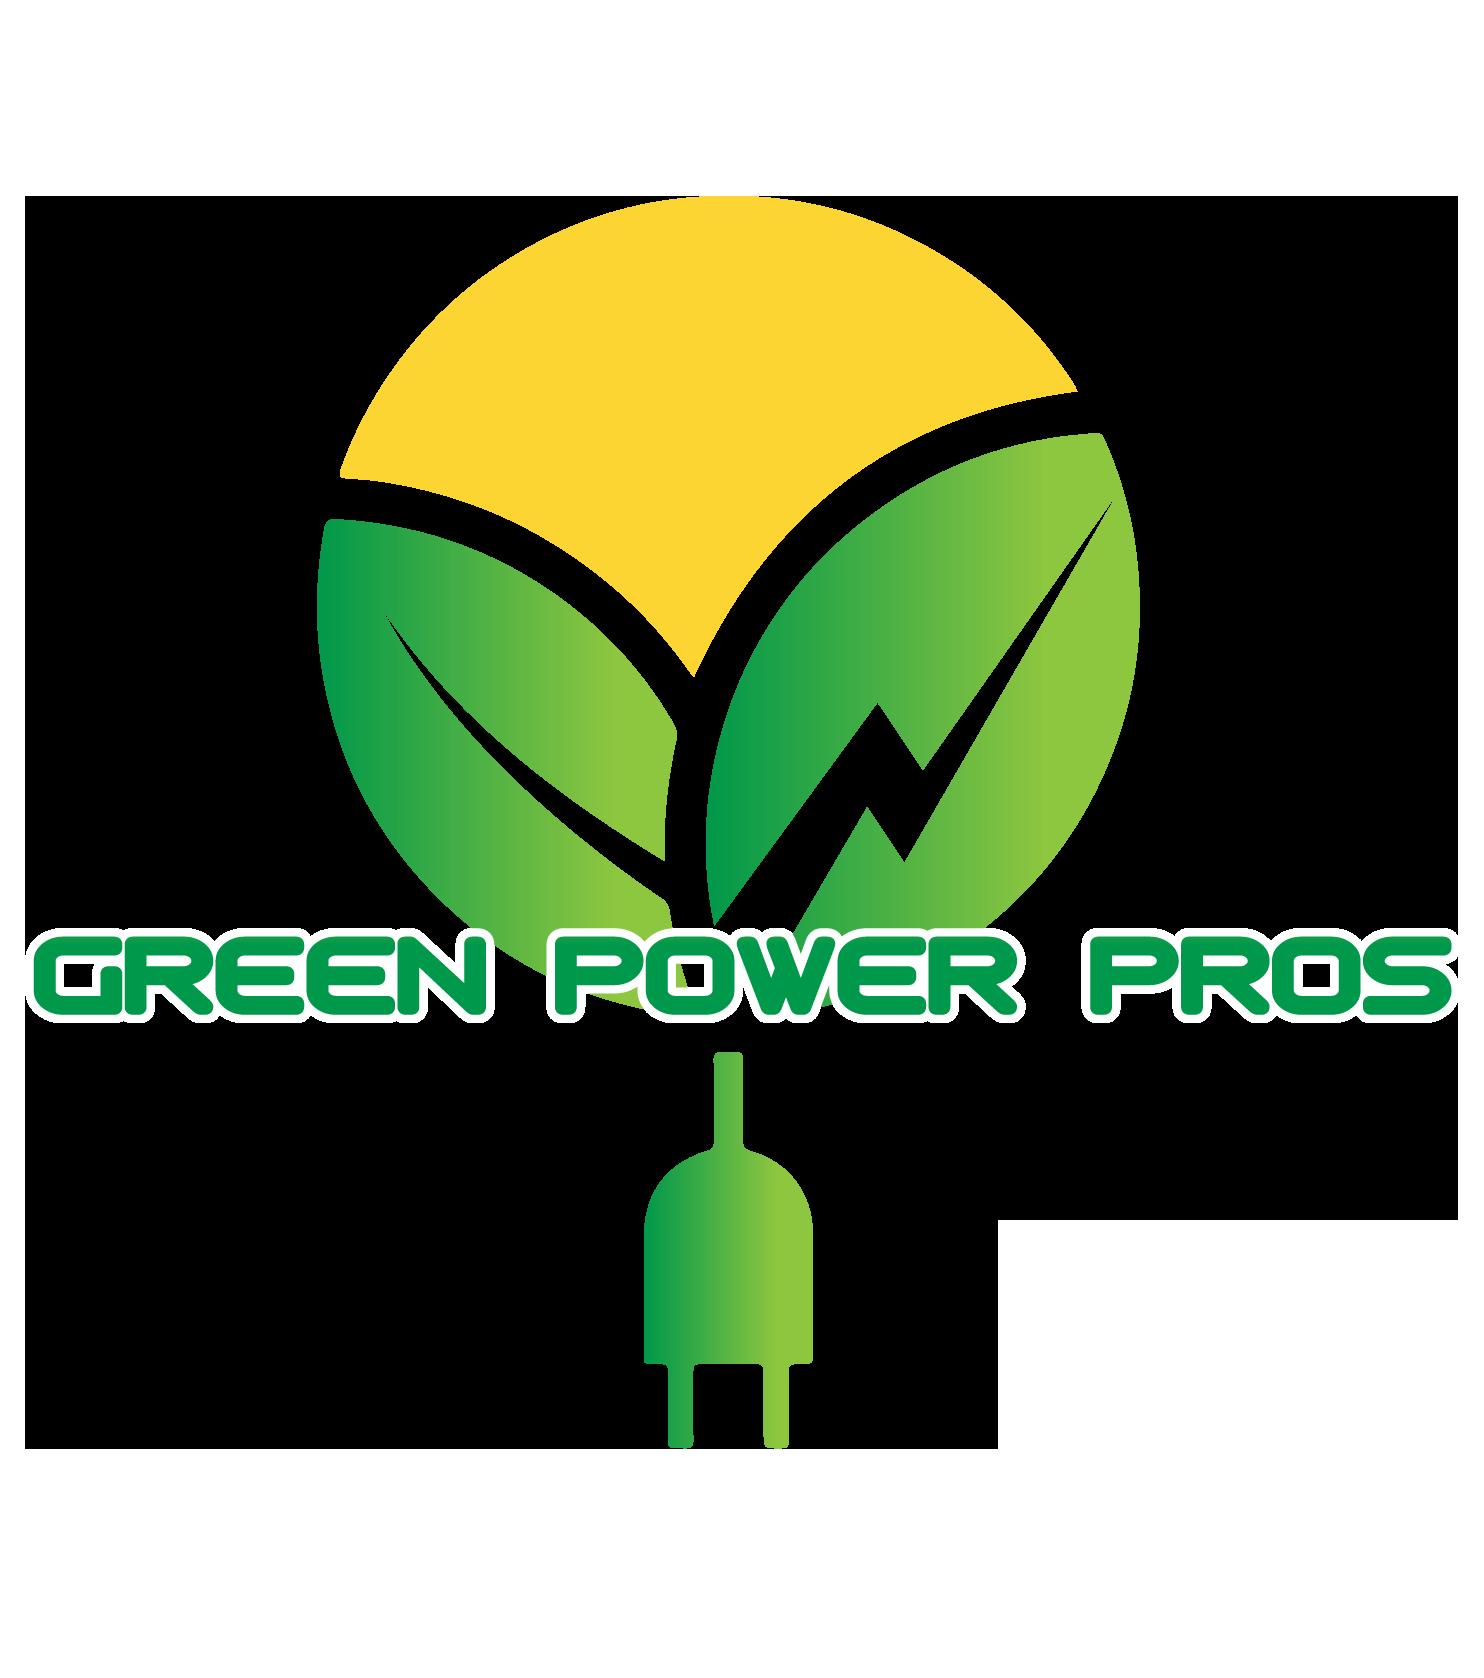 Green Power Pros